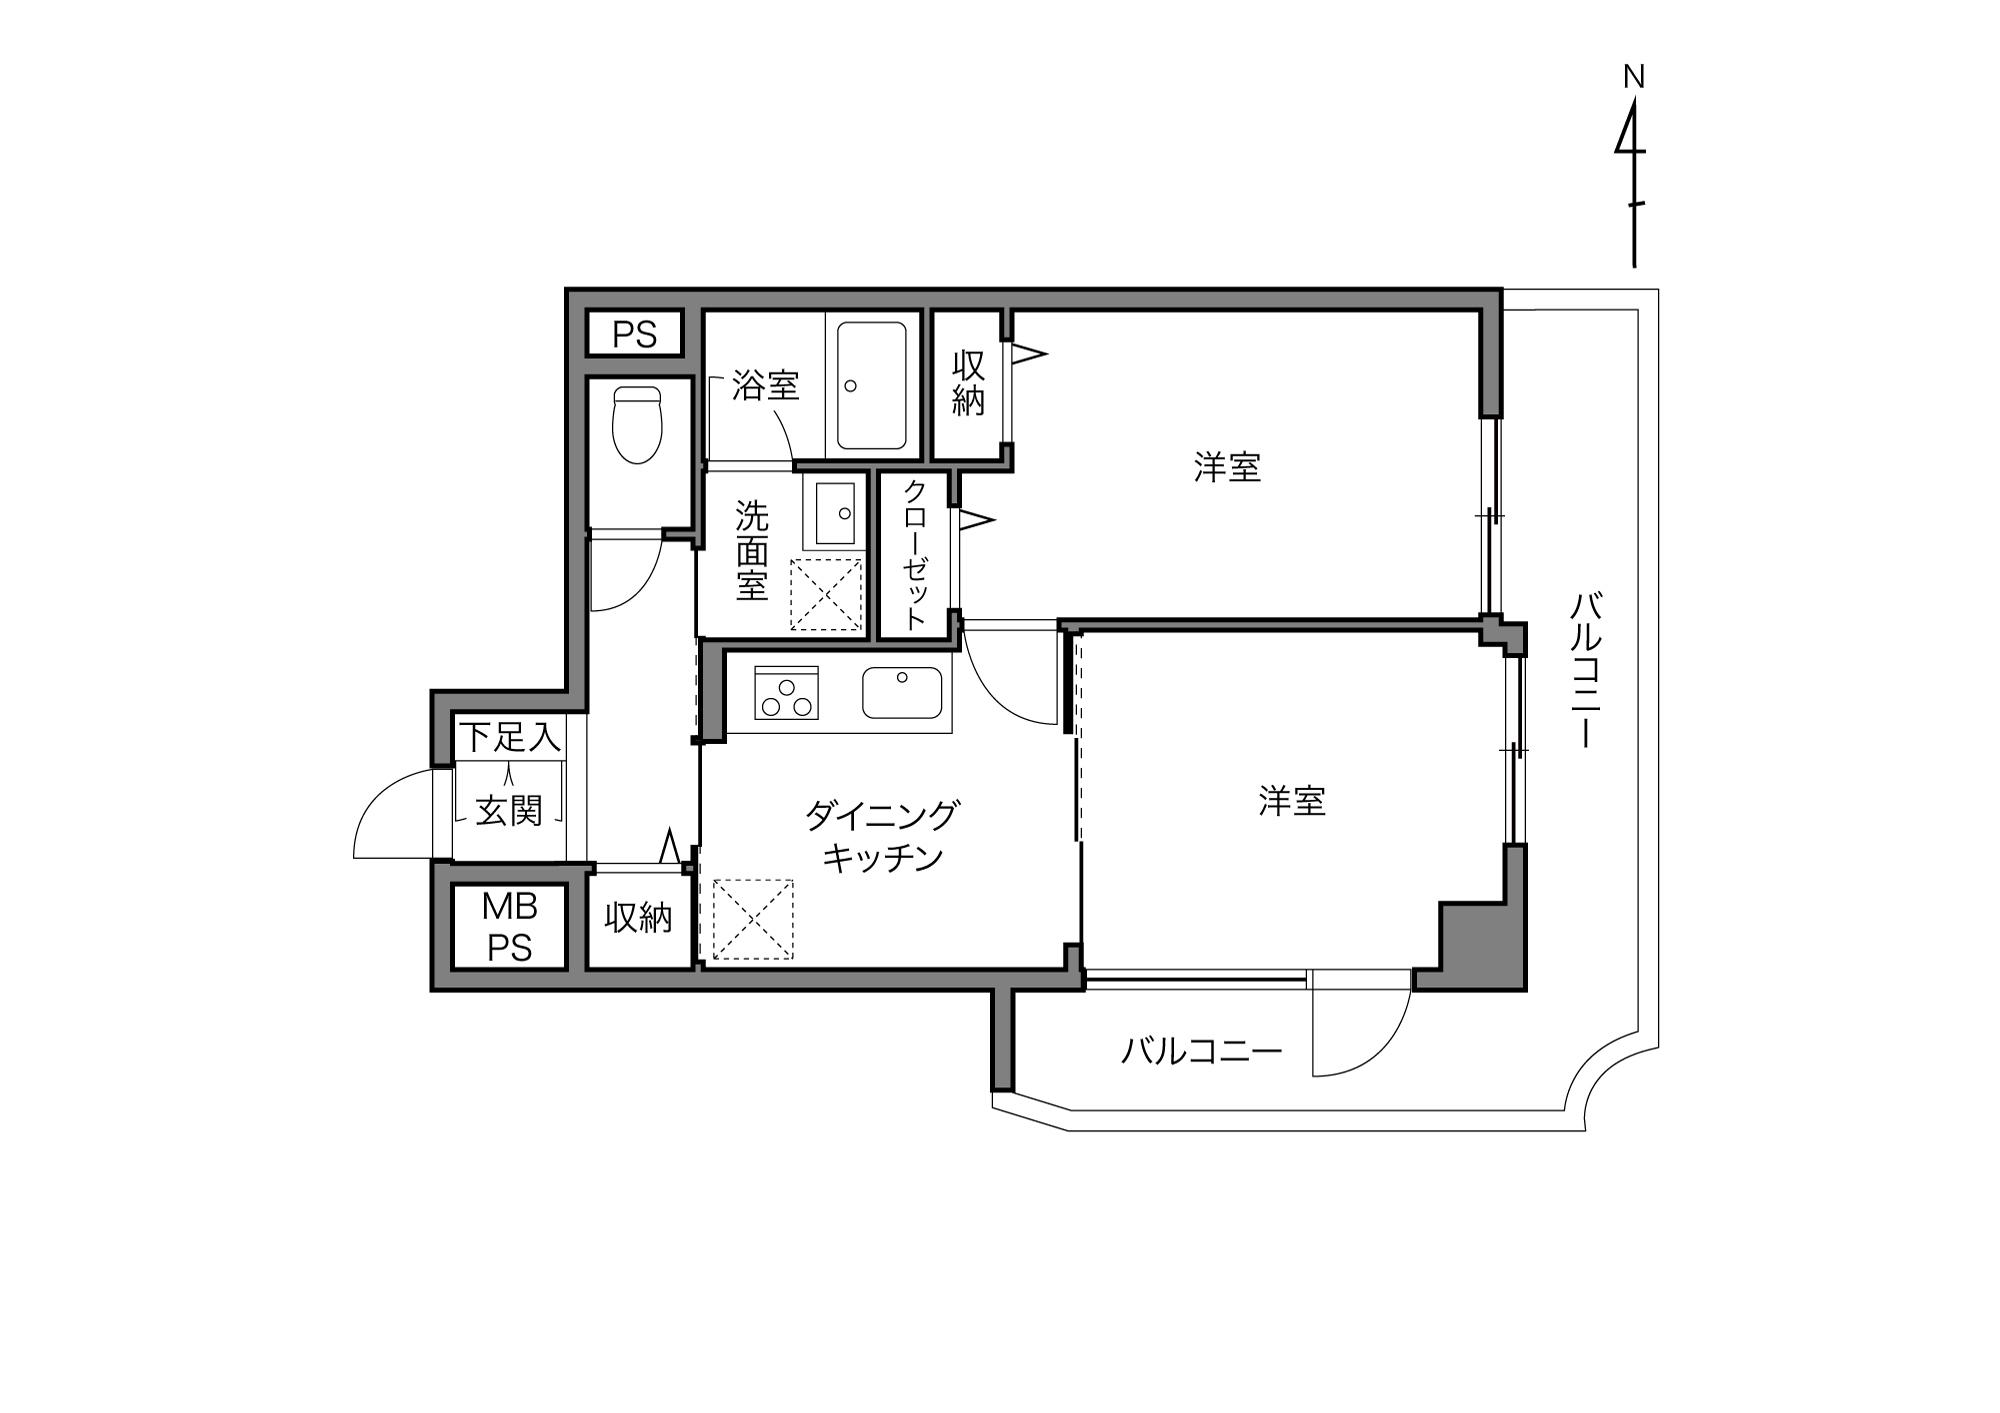 錦糸町駅 / 2DK / 39.97㎡